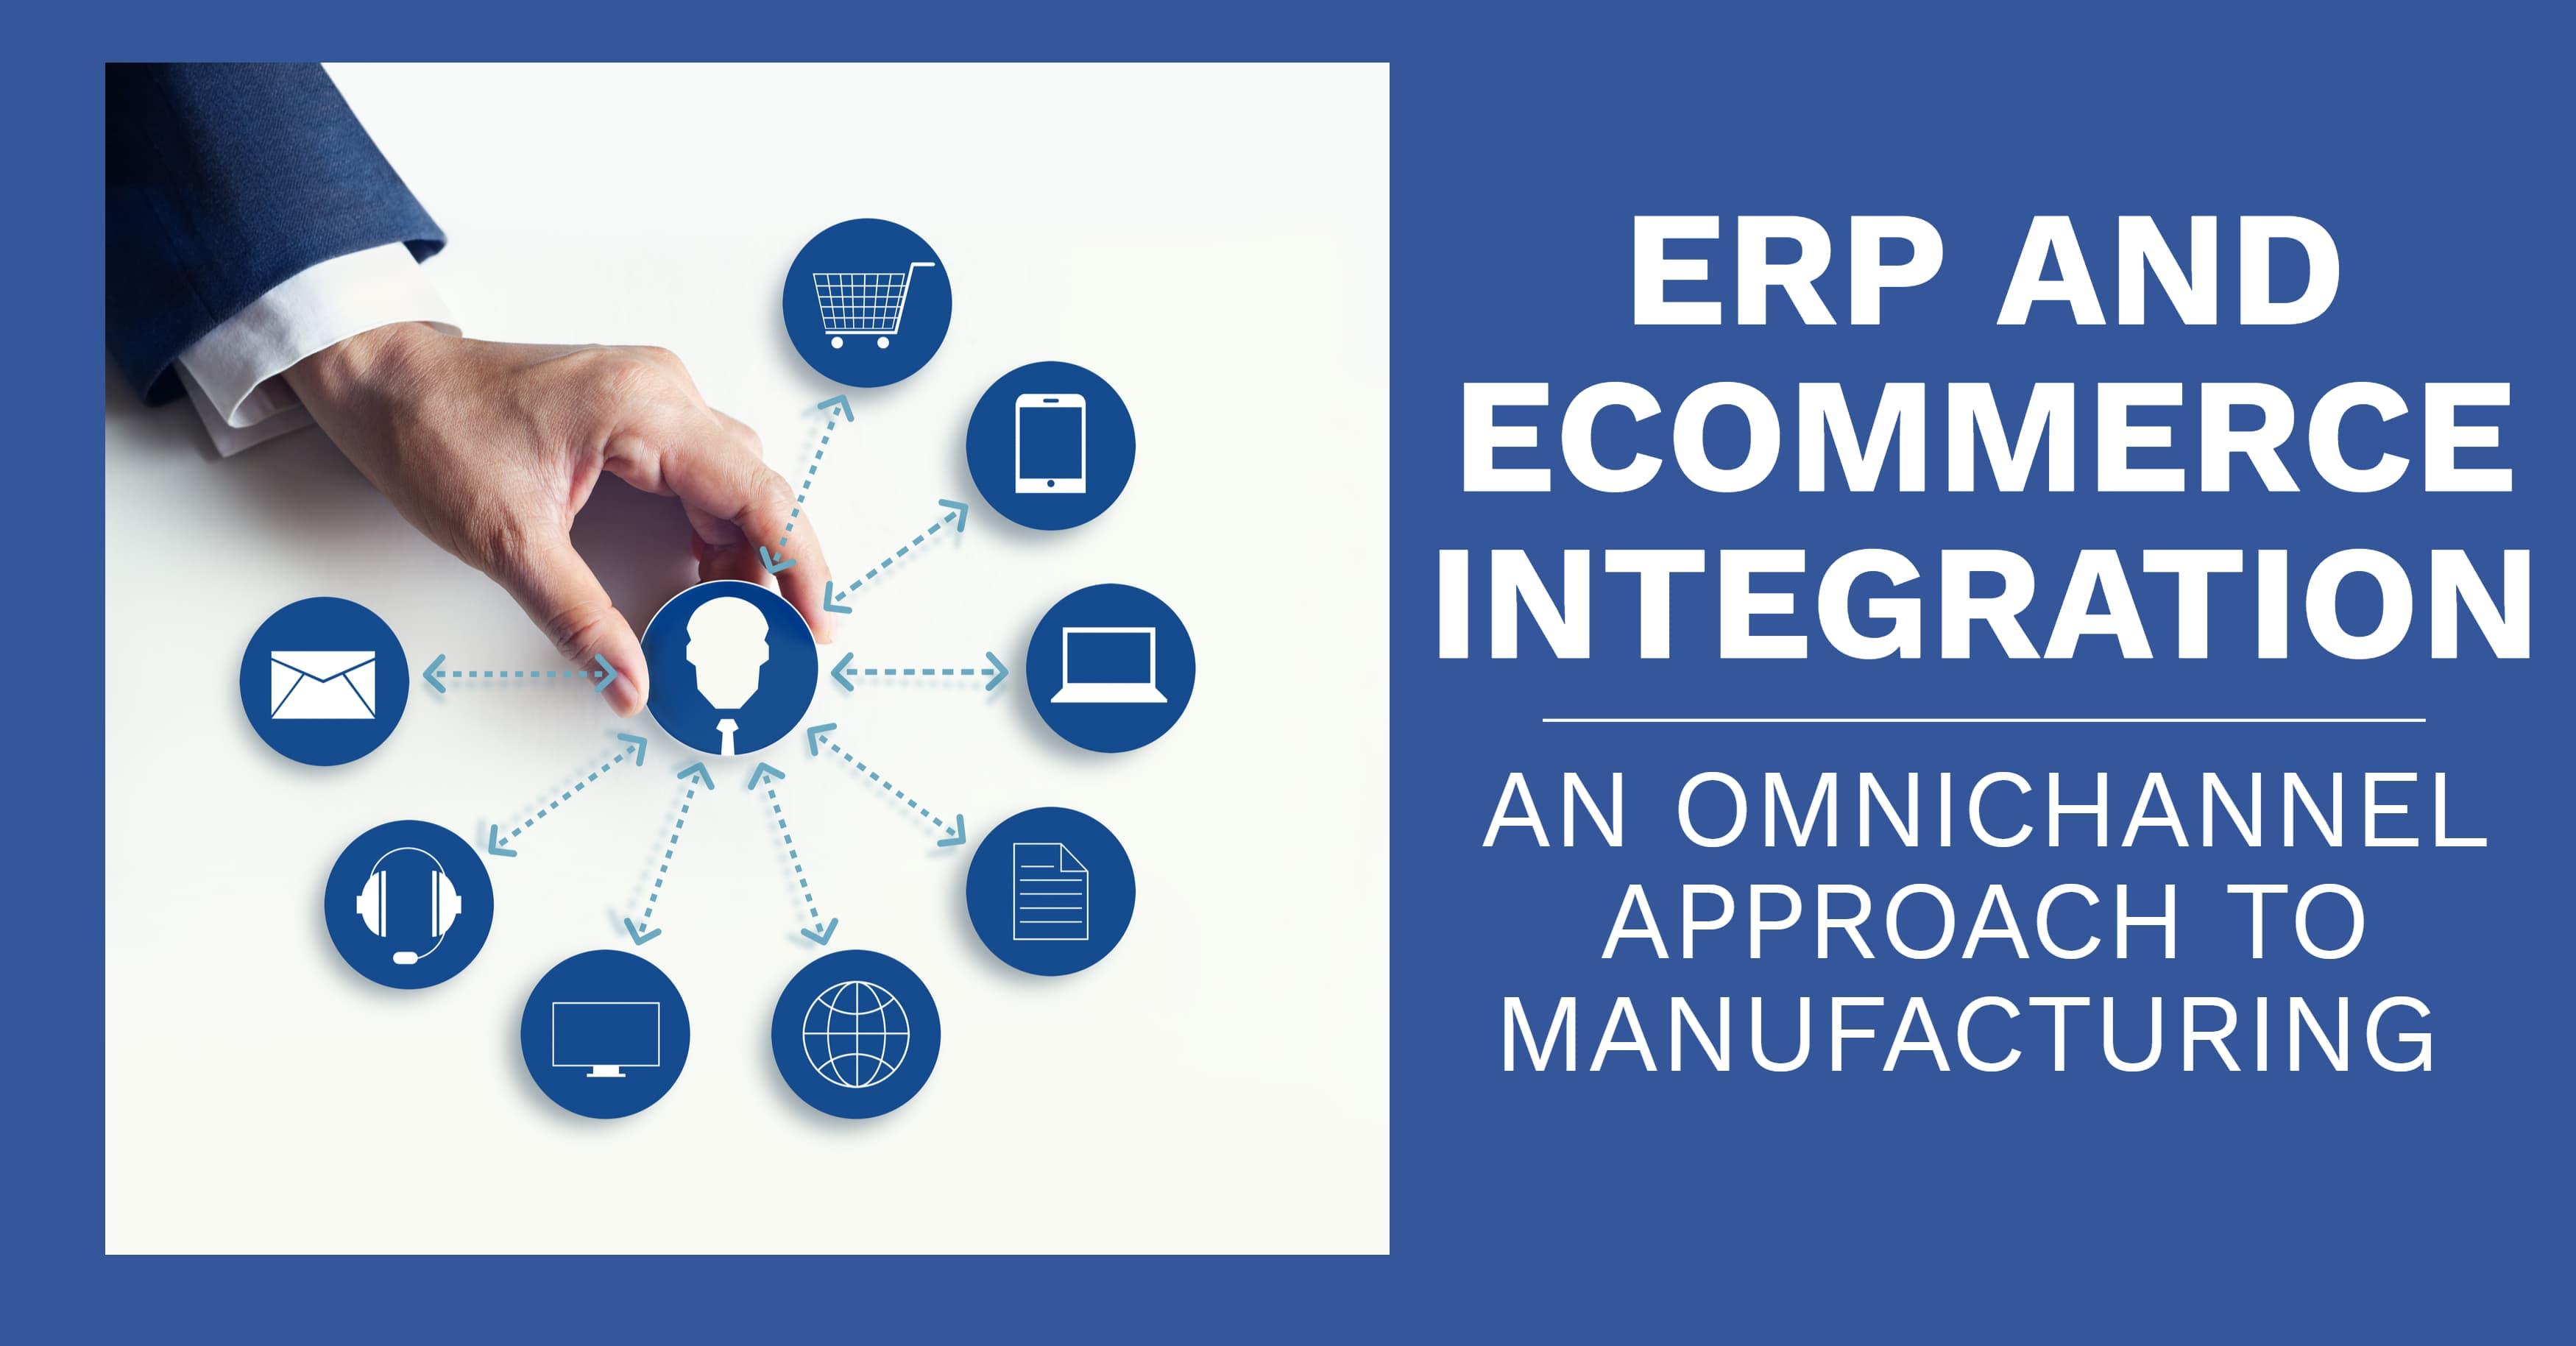 ERP and eCommerce Integration for Omnichannel Journeys